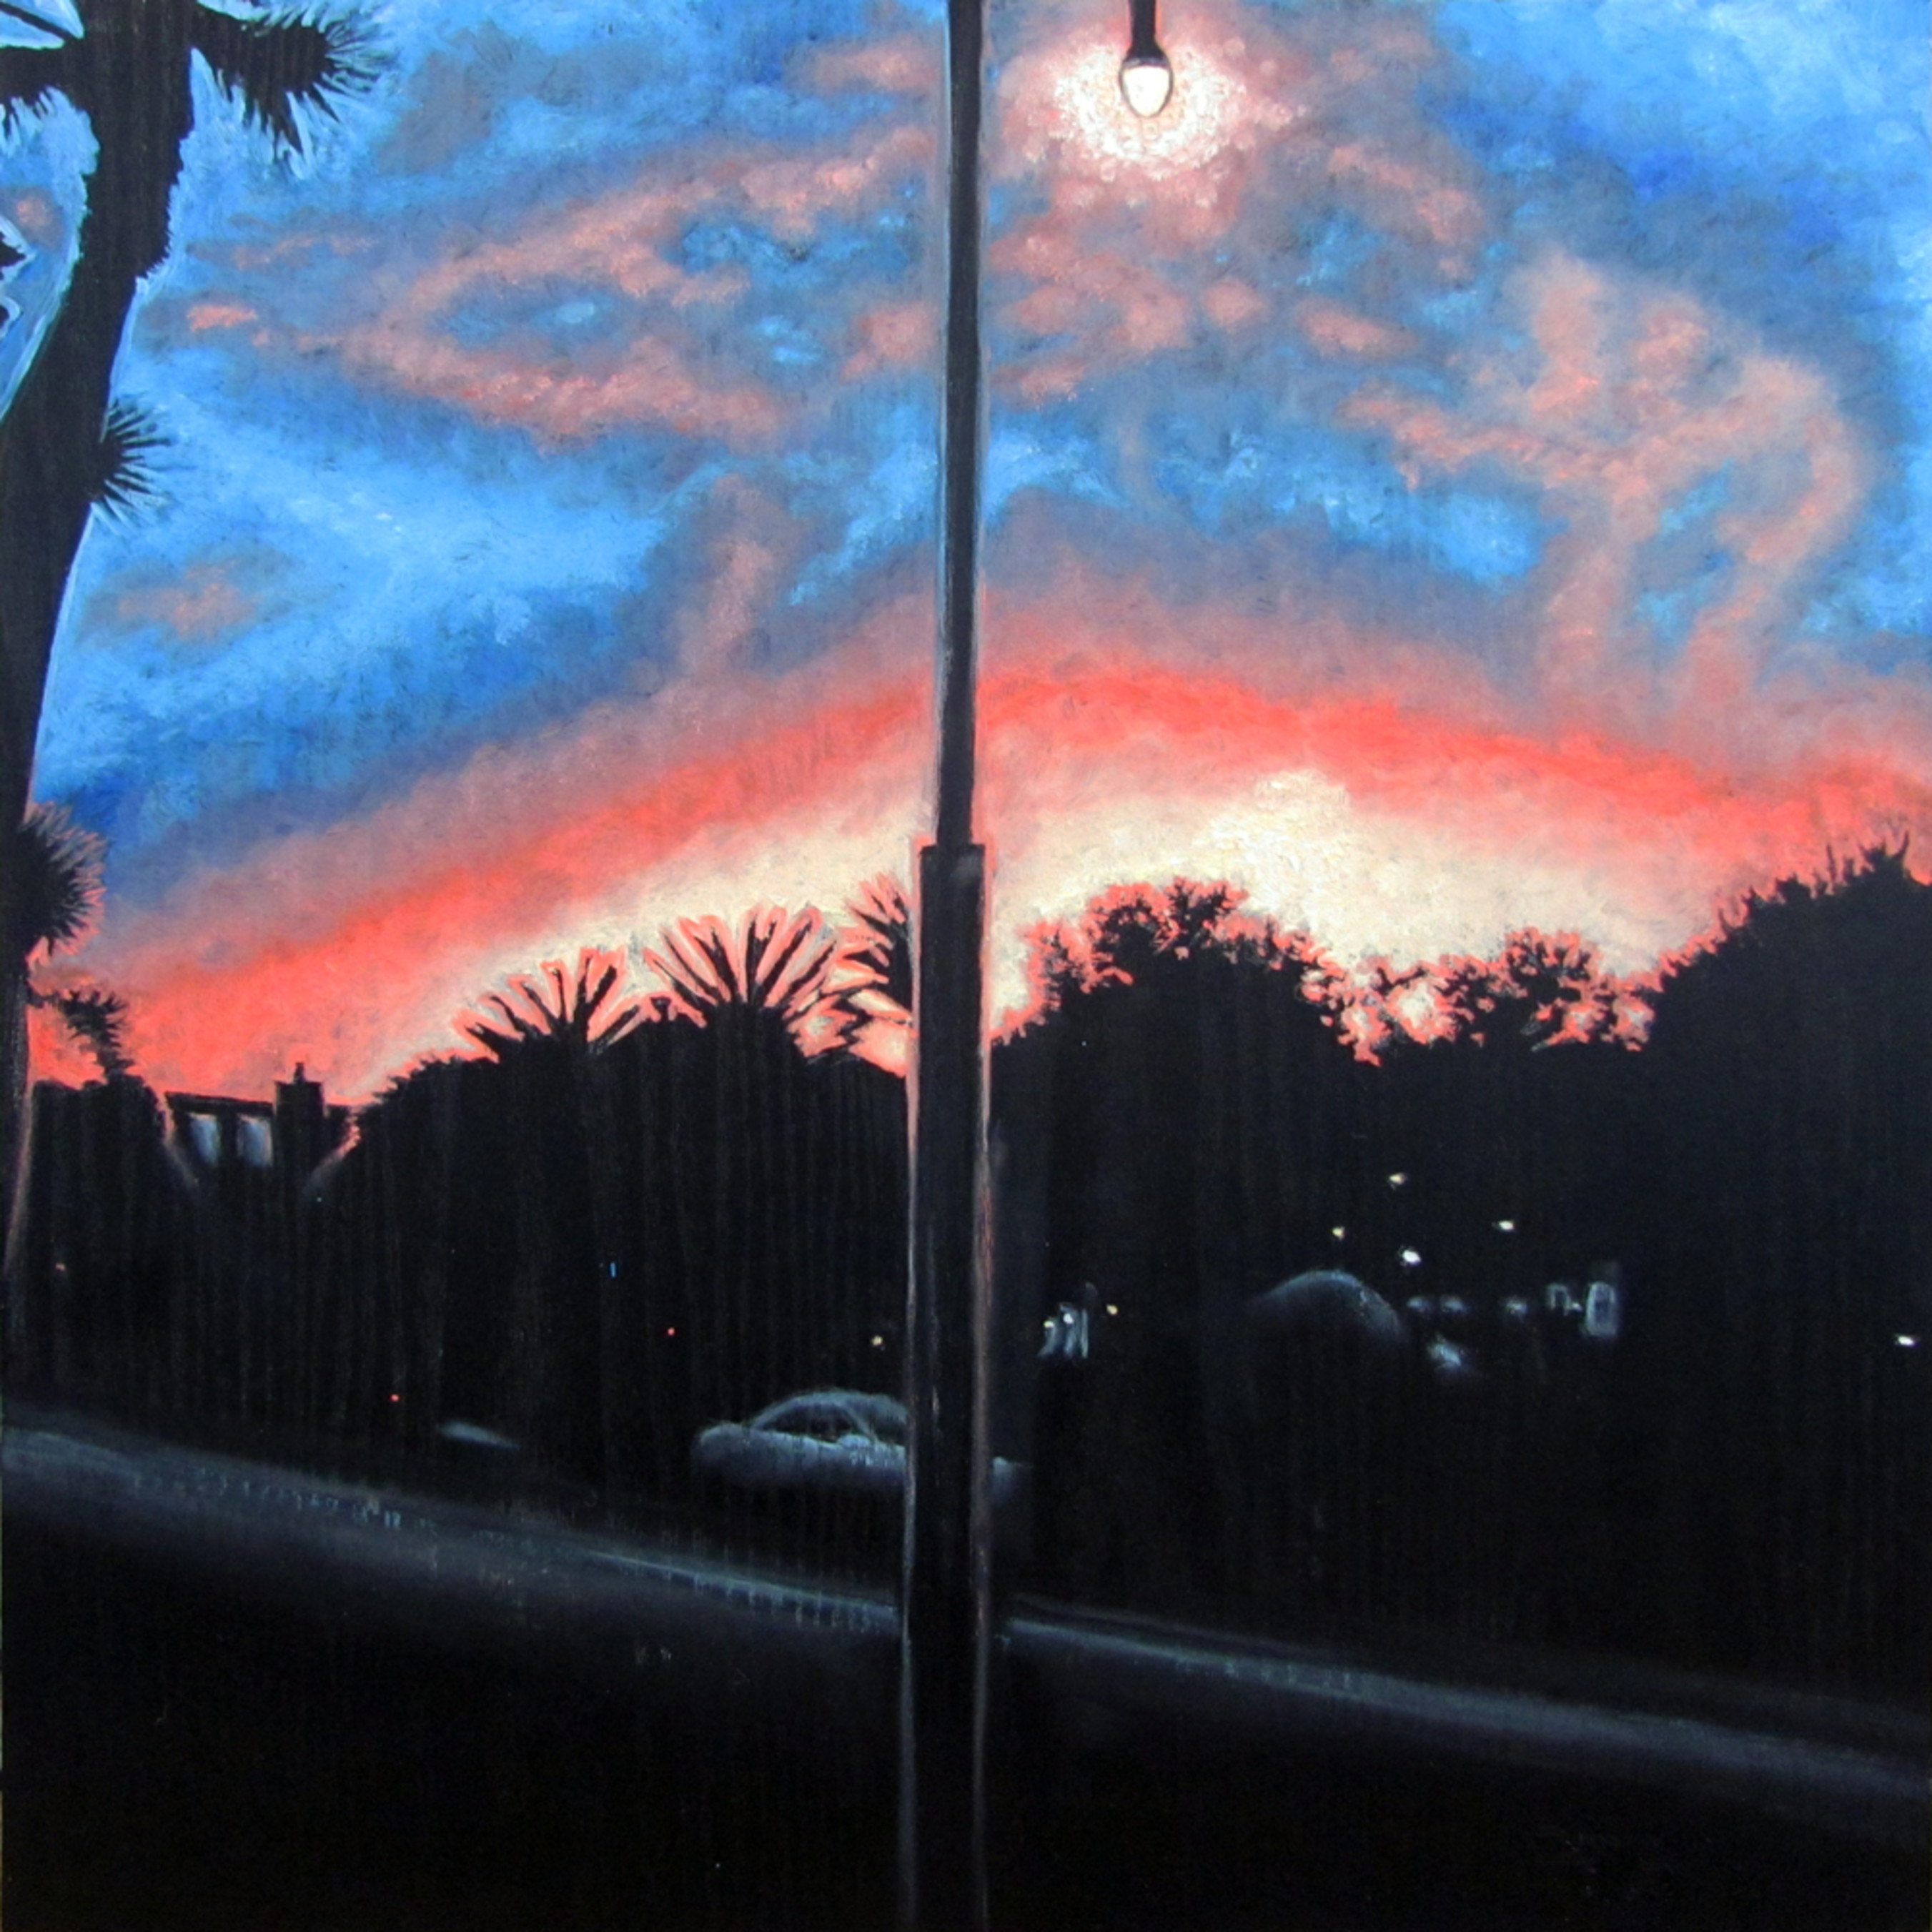 Sunset over playa vista print zspvei